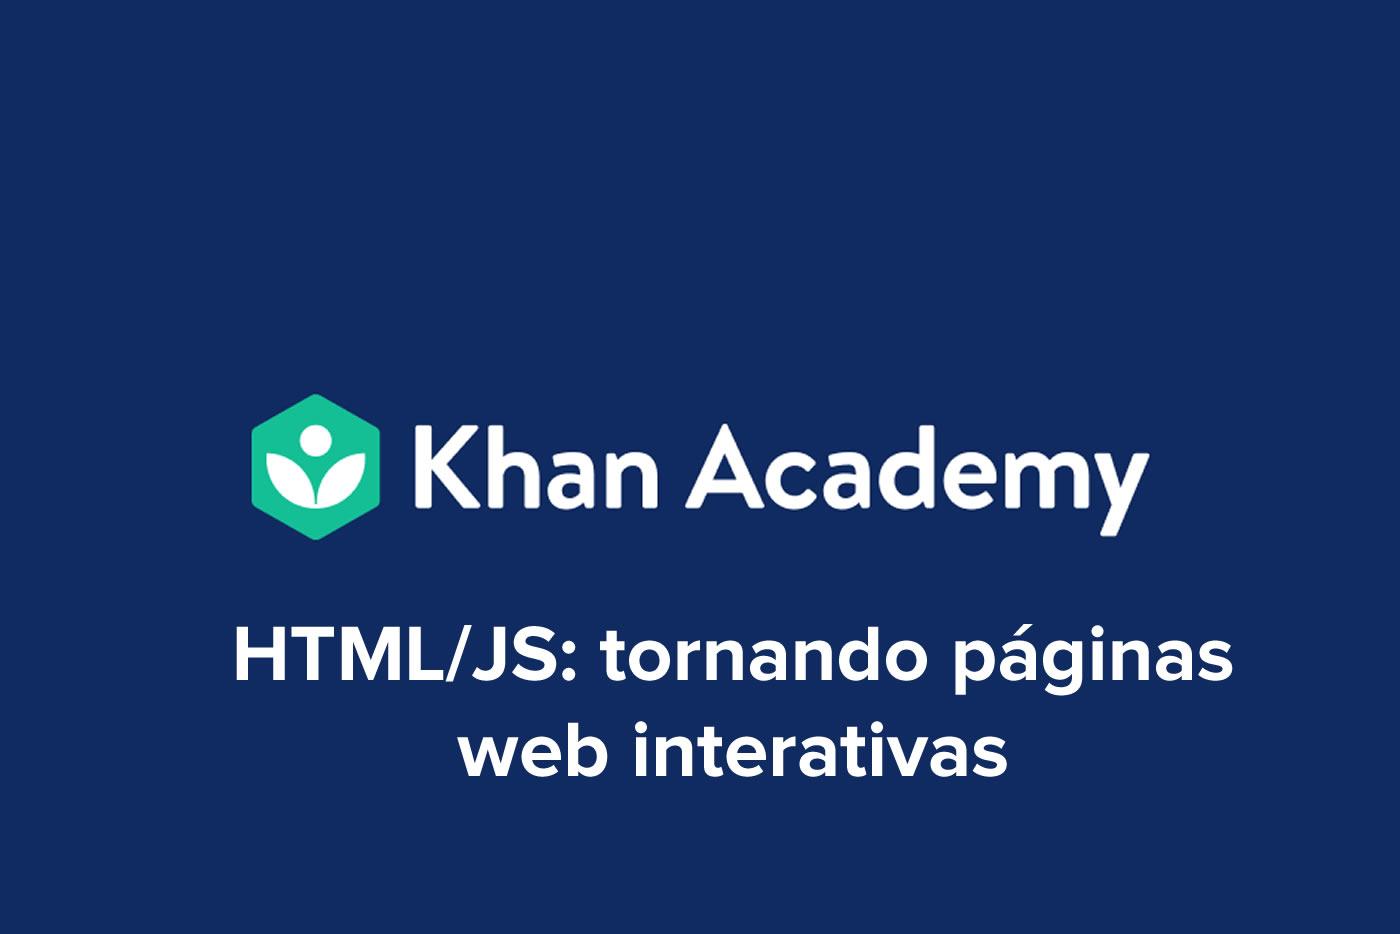 HTML/JS: tornando páginas web interativas